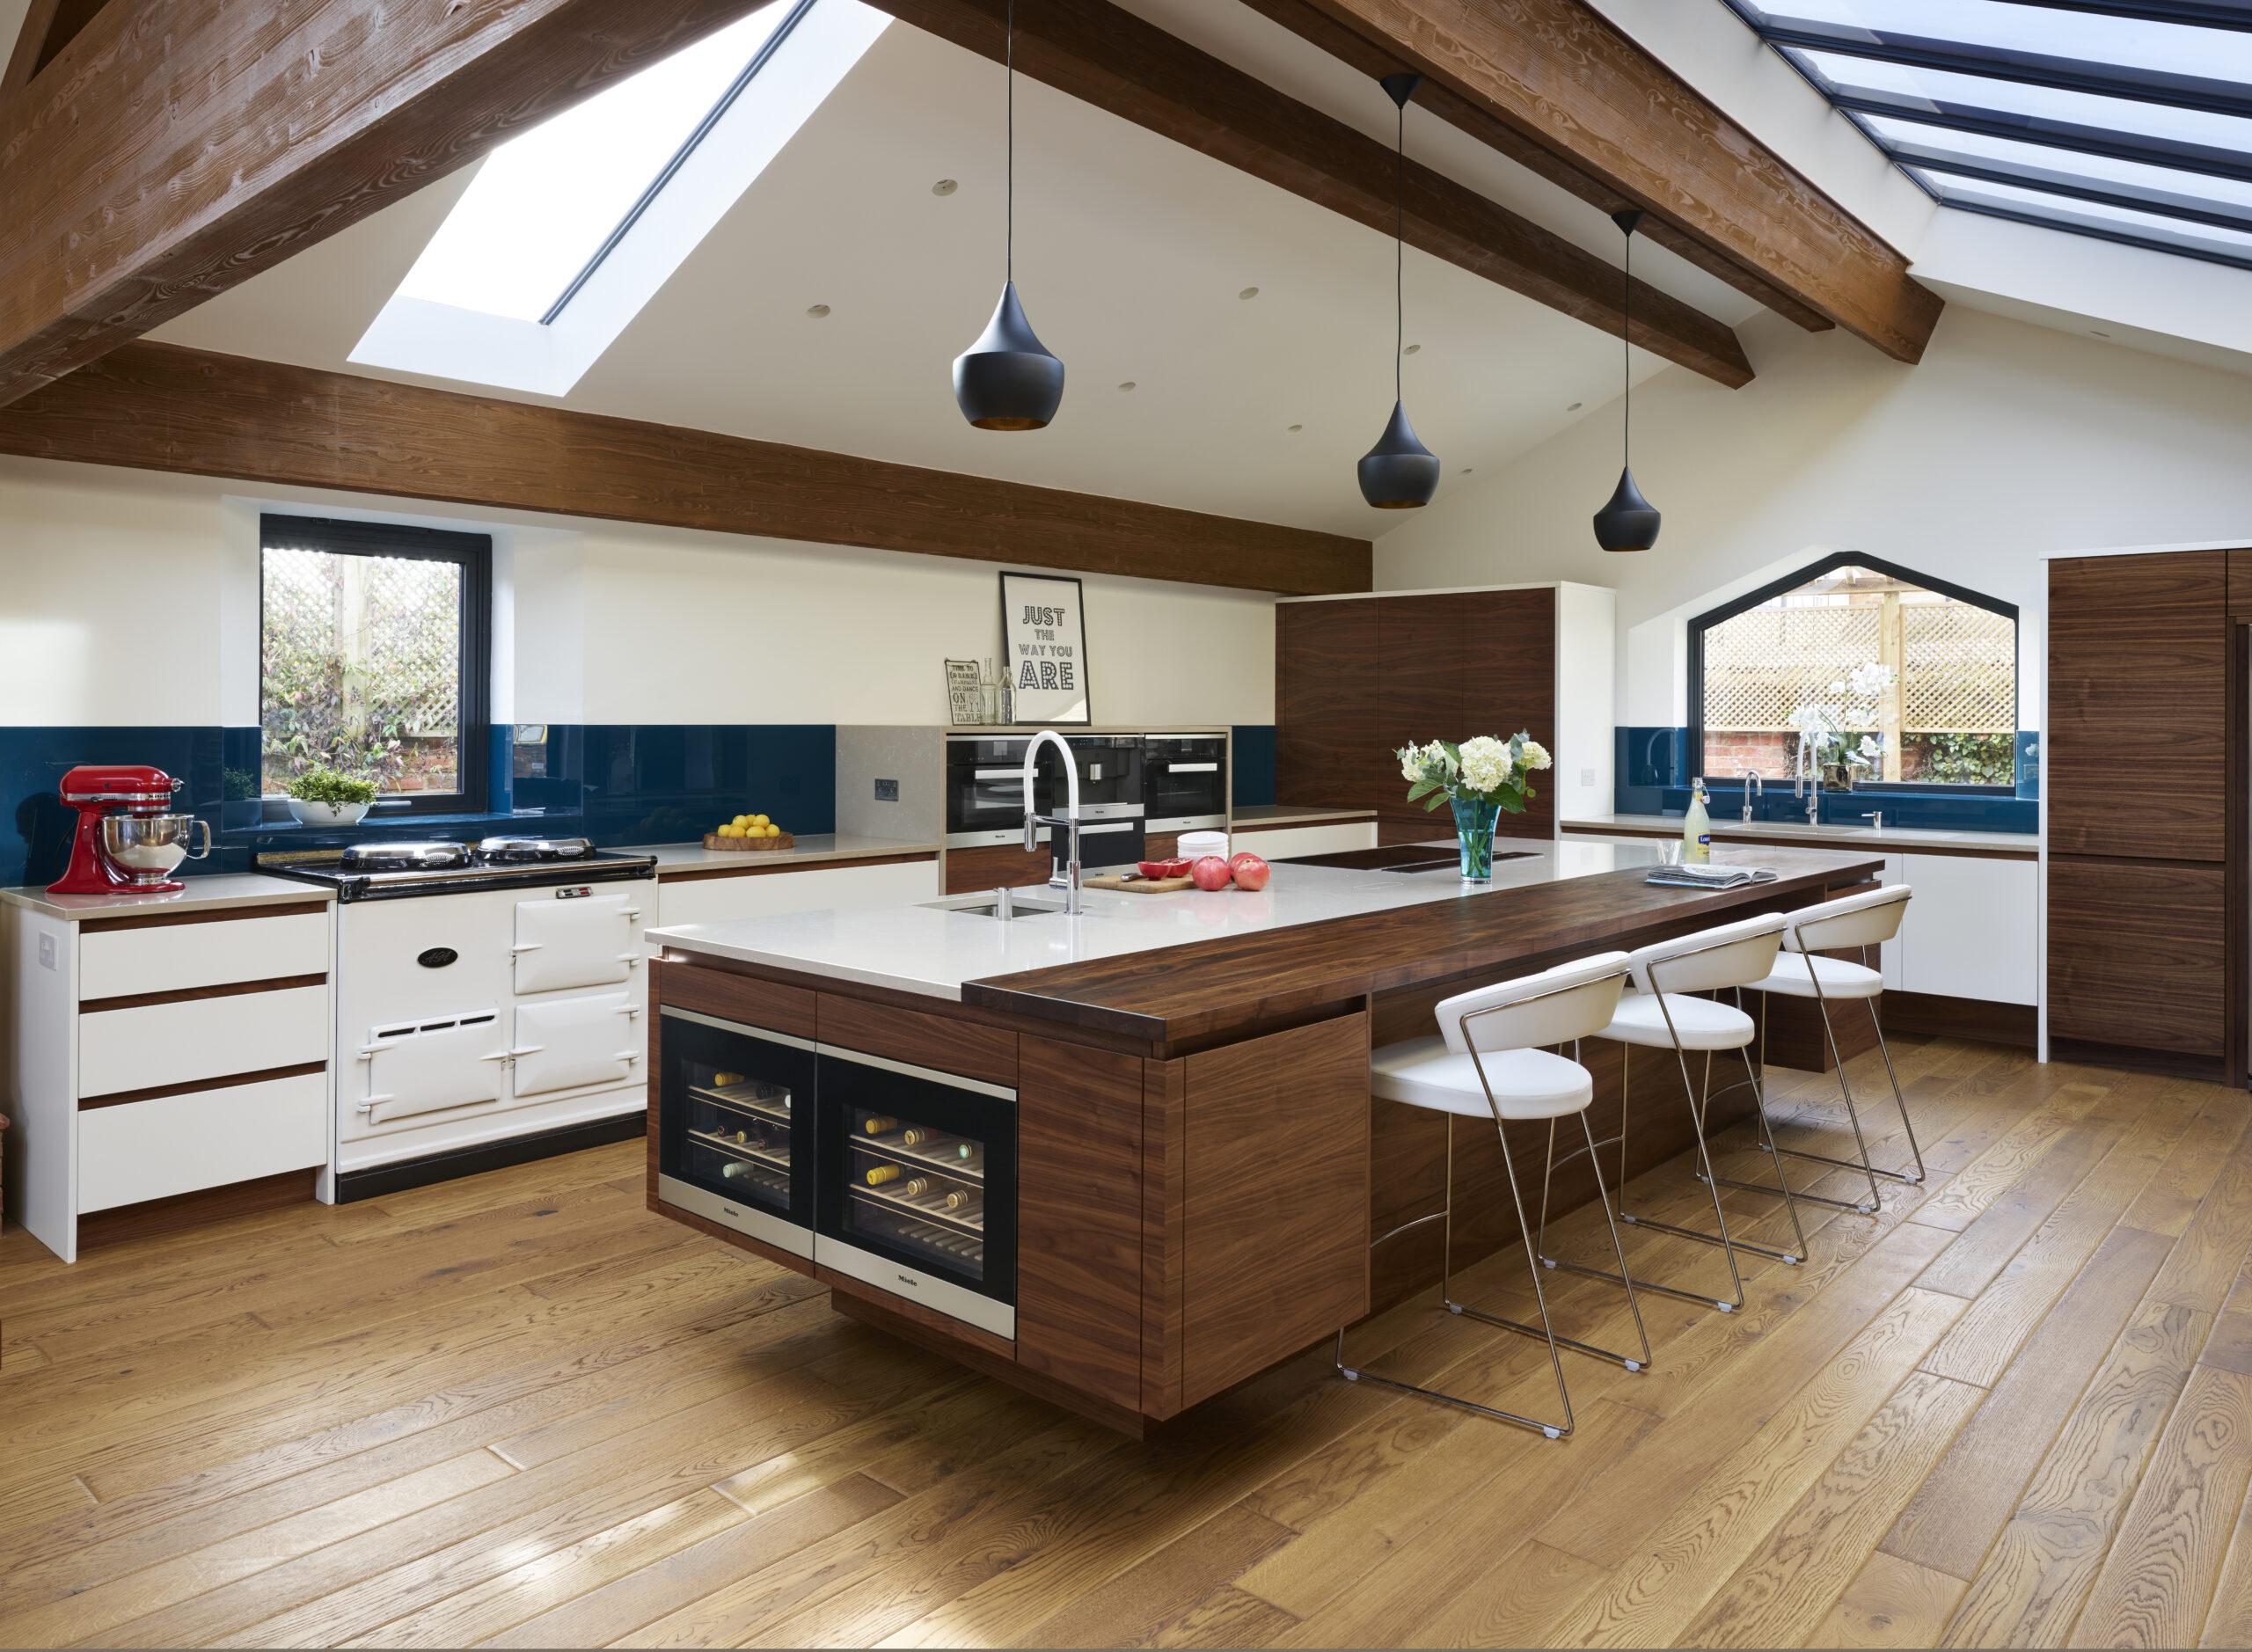 Simon Taylor Furniture - Potterspury - Kitchen Island